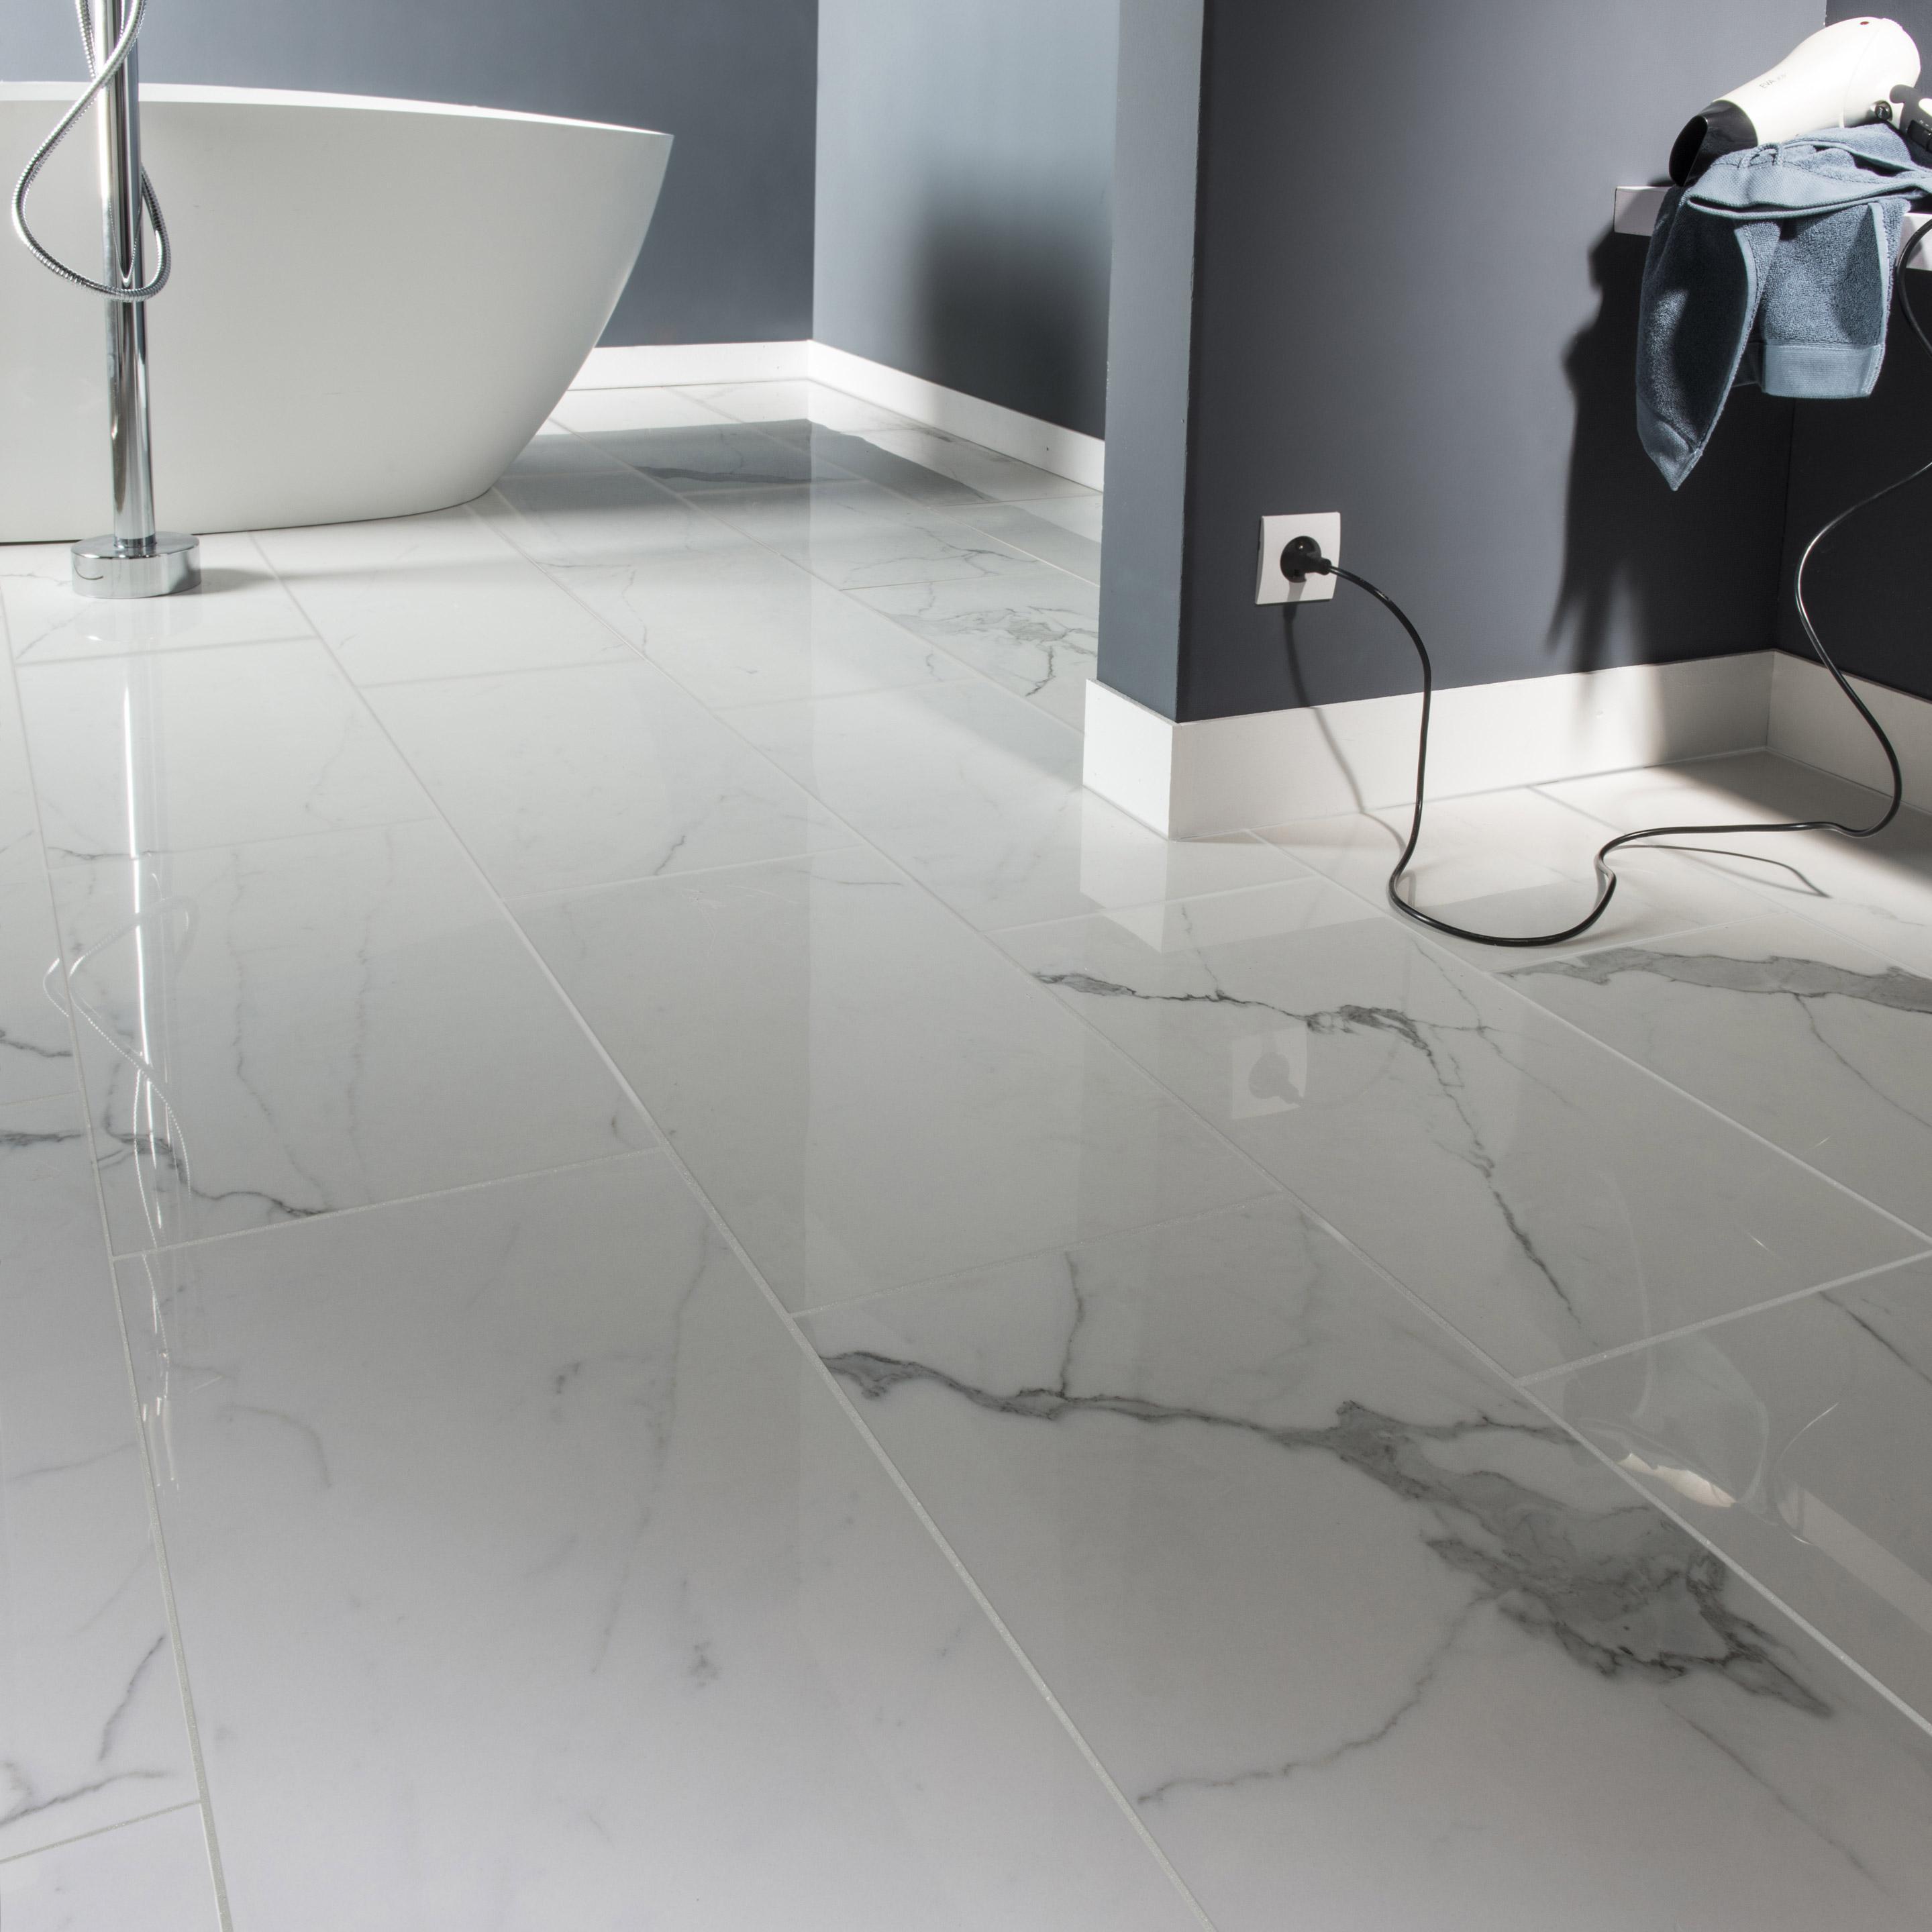 Comment Nettoyer Joint Blanc Carrelage Sol carrelage sol/mur intenso marbre blanc rimini l.30xl.60 cm cerim inspired+39